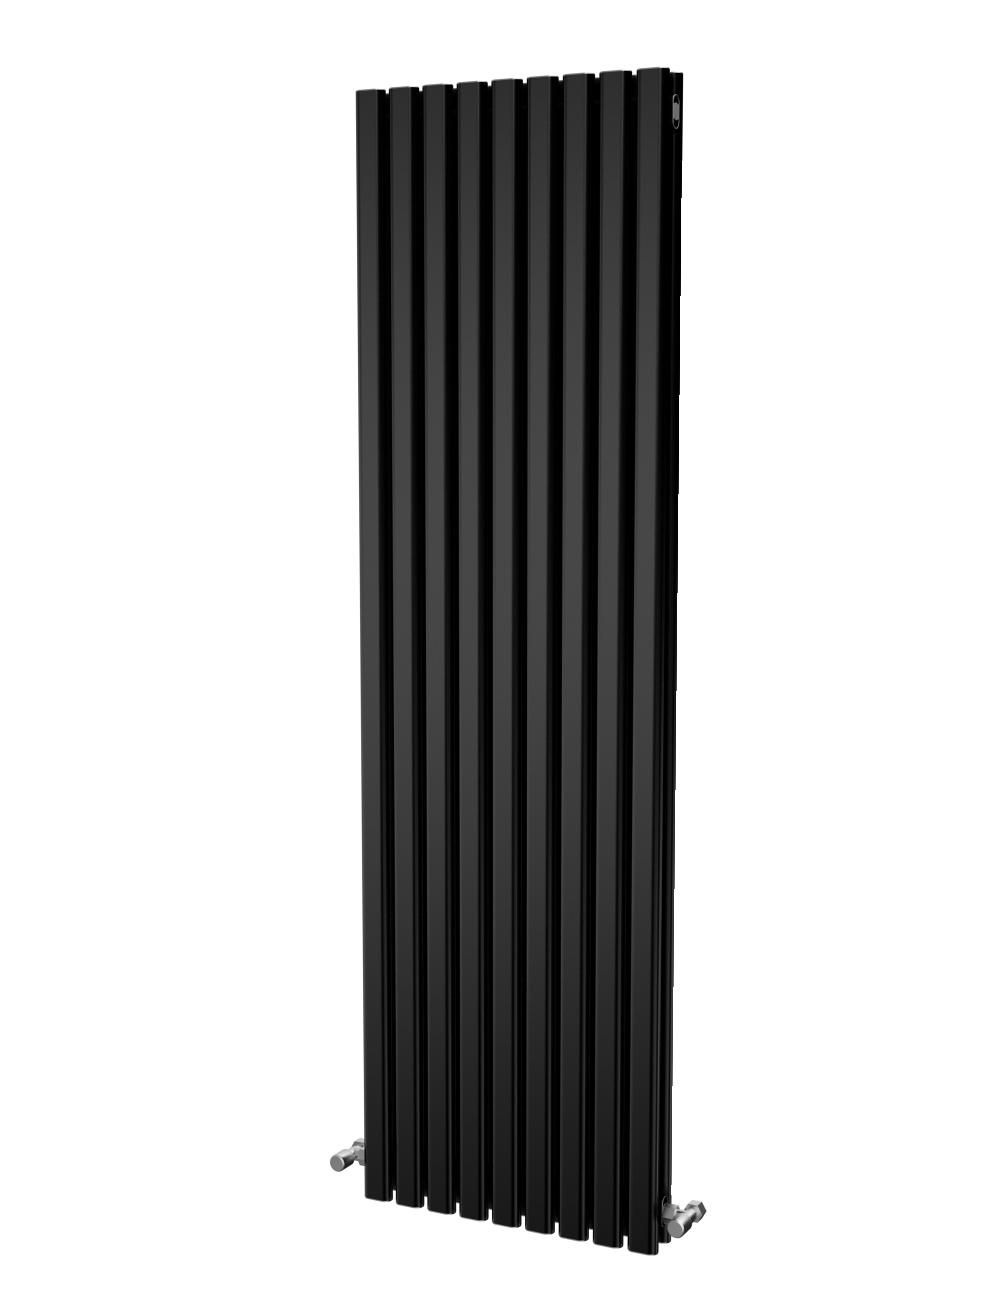 Elite Black: 1800mm x 530mm